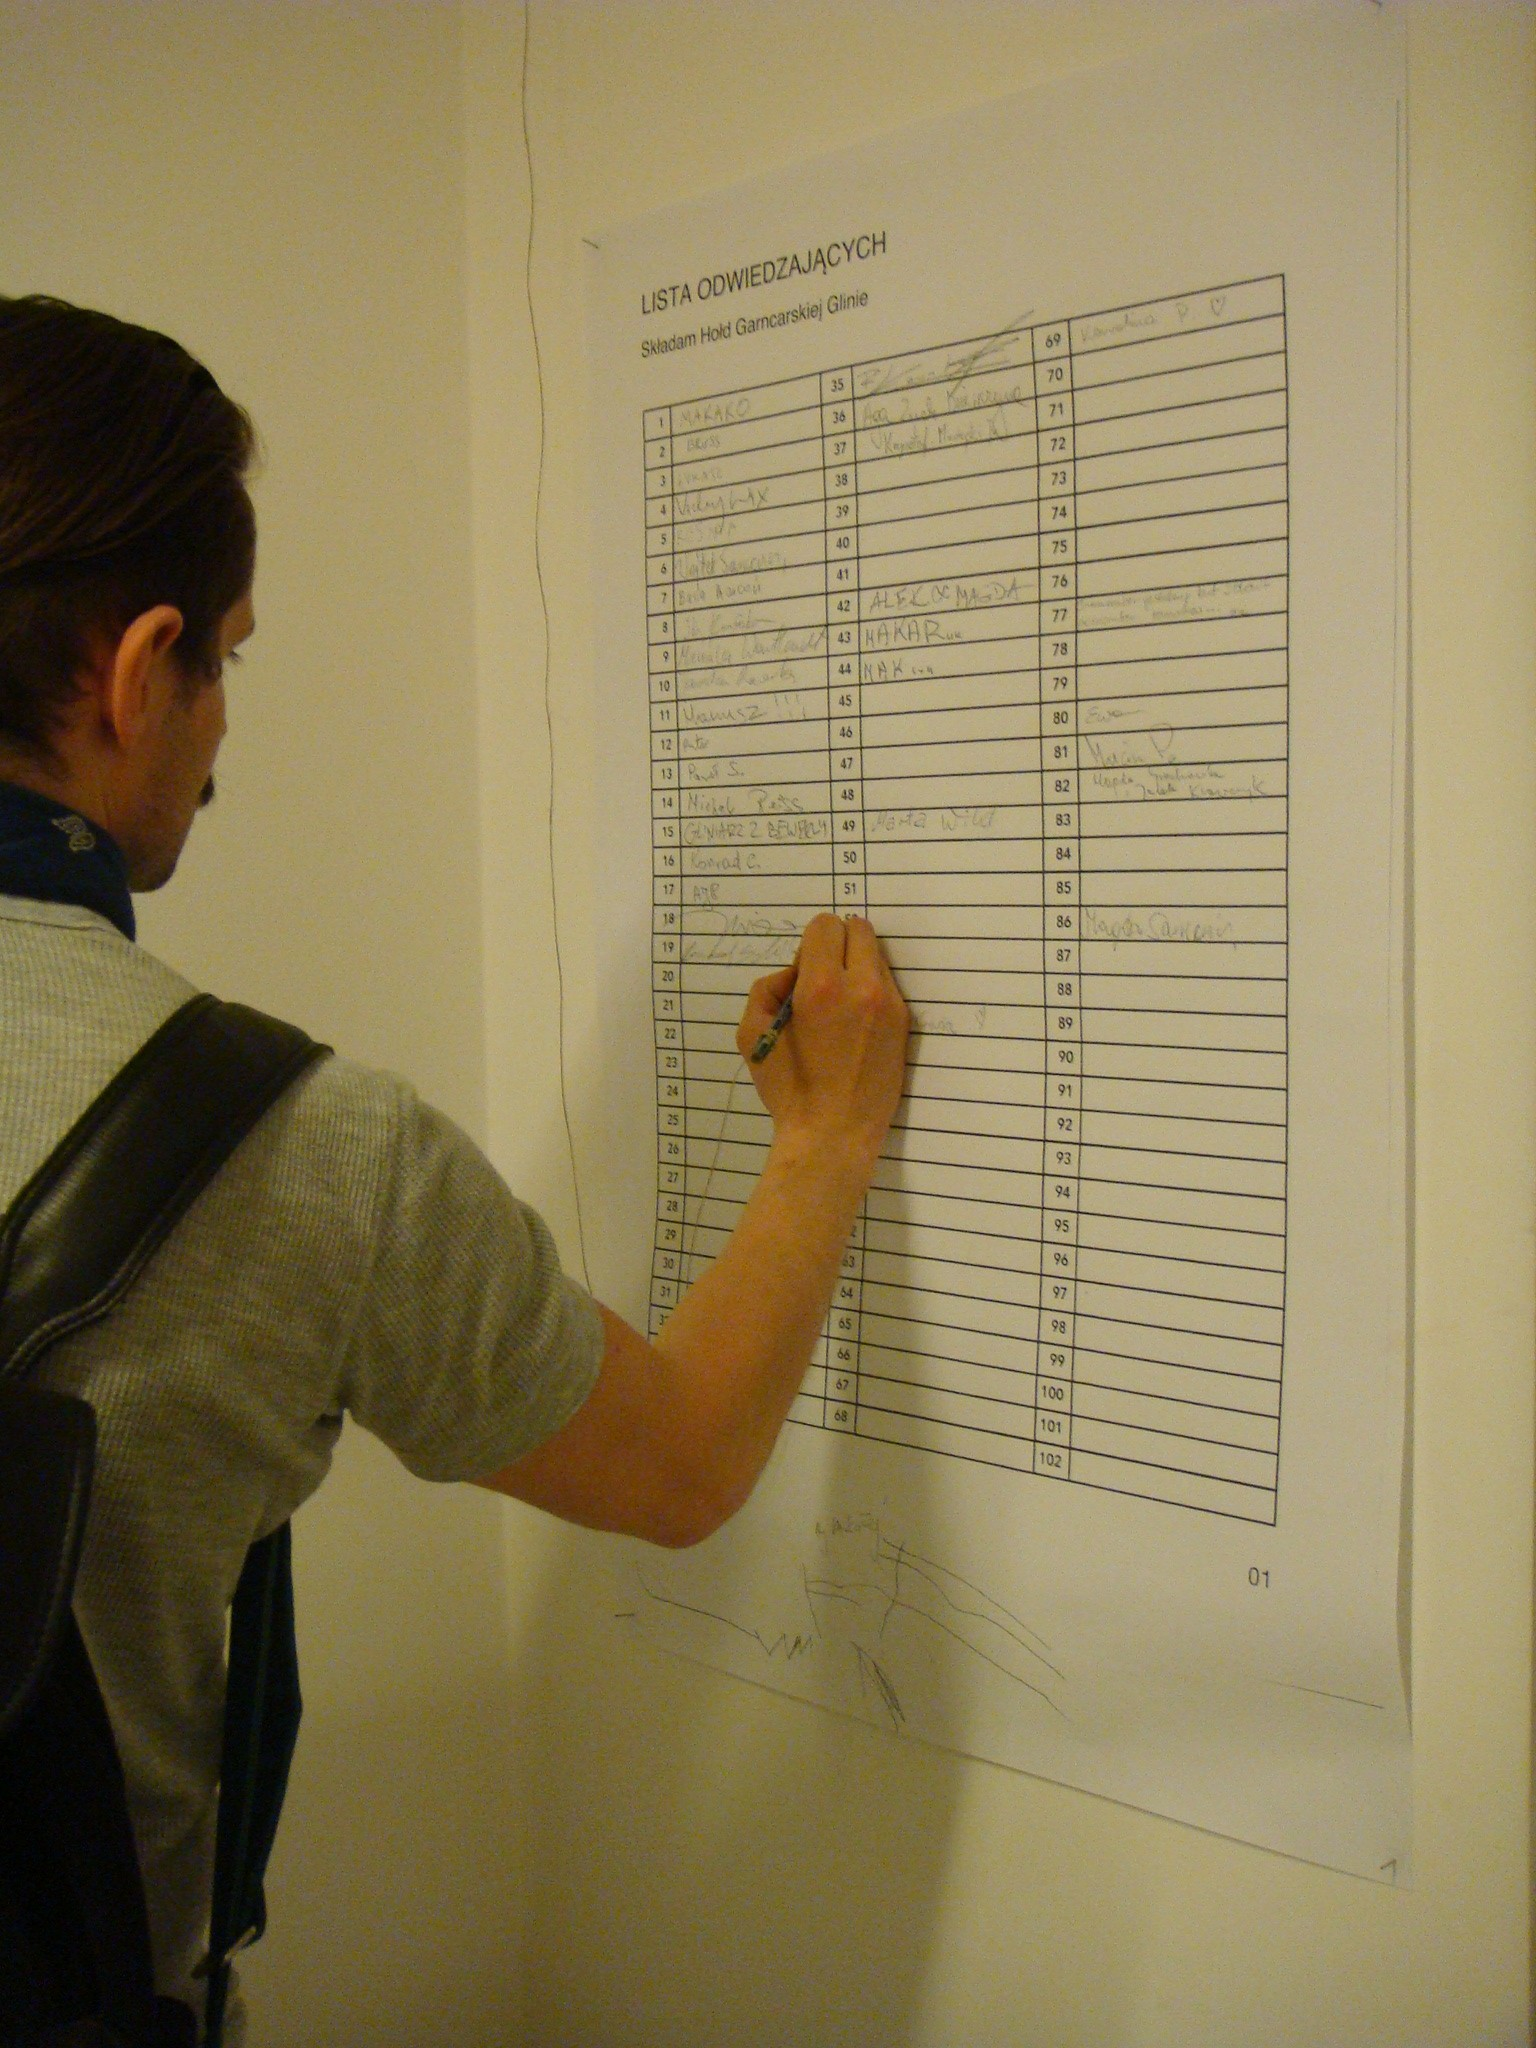 Dominik Lang, Nominal List of Visitors, 2013